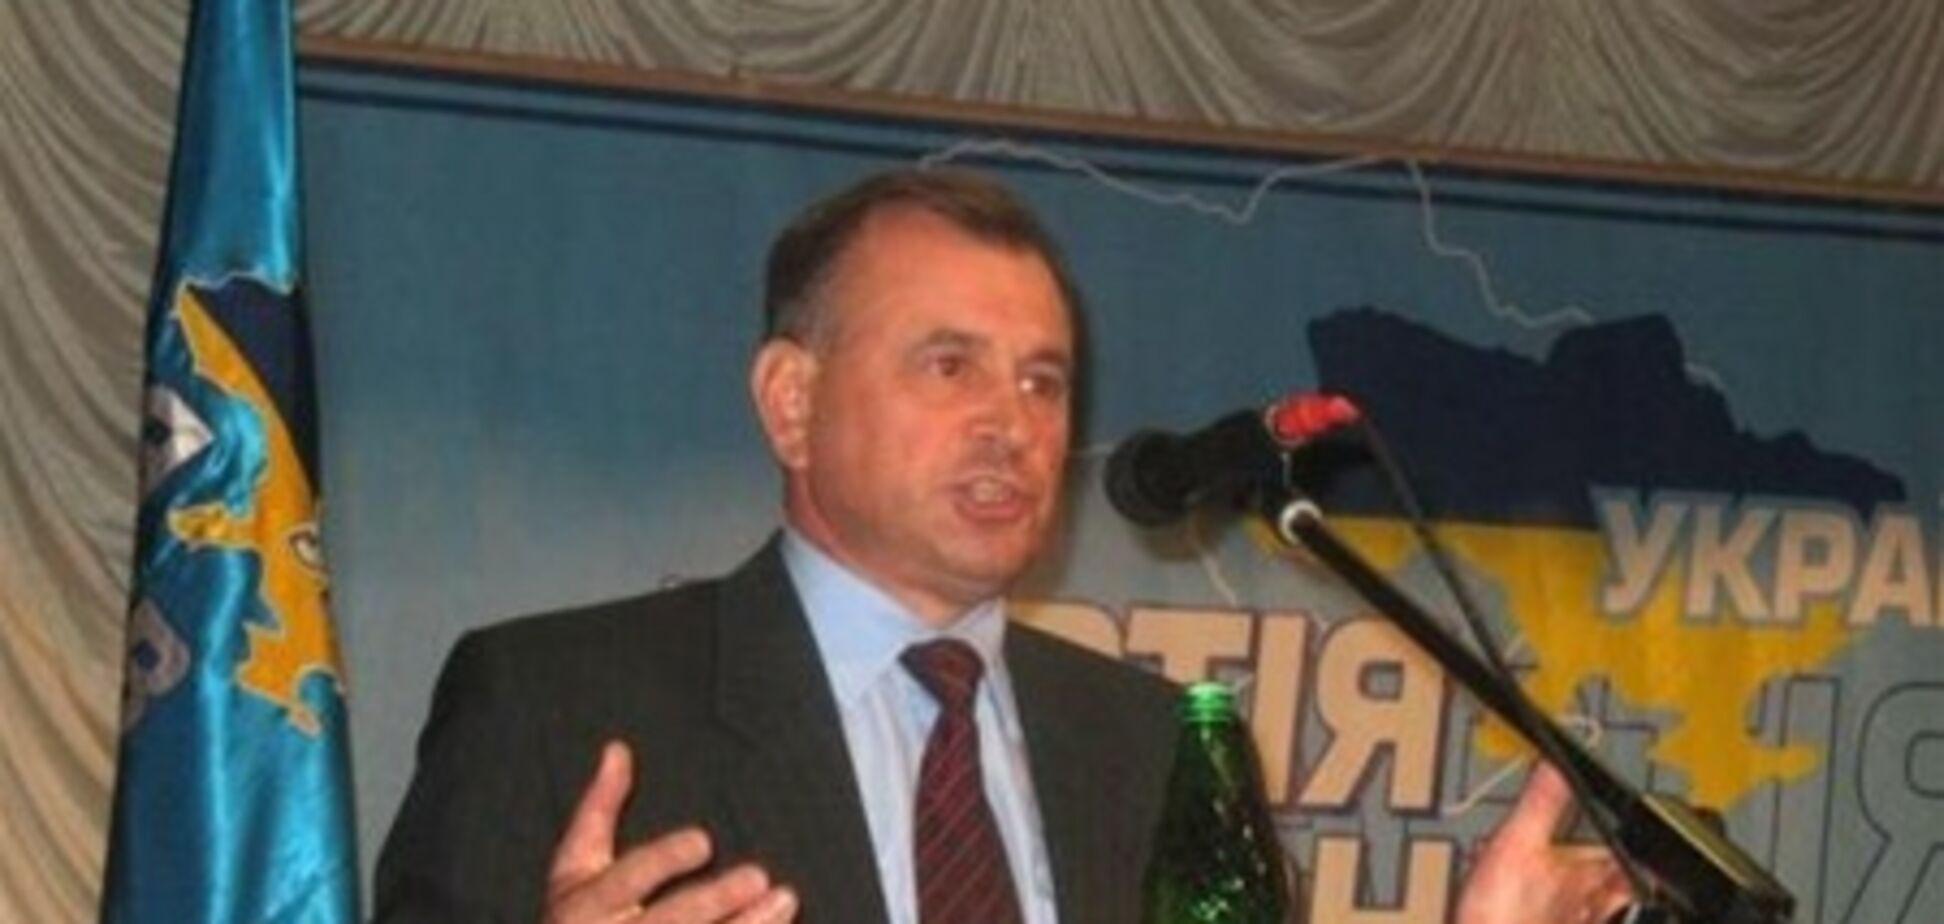 Губернатор Житомира нецензурно висловлюється